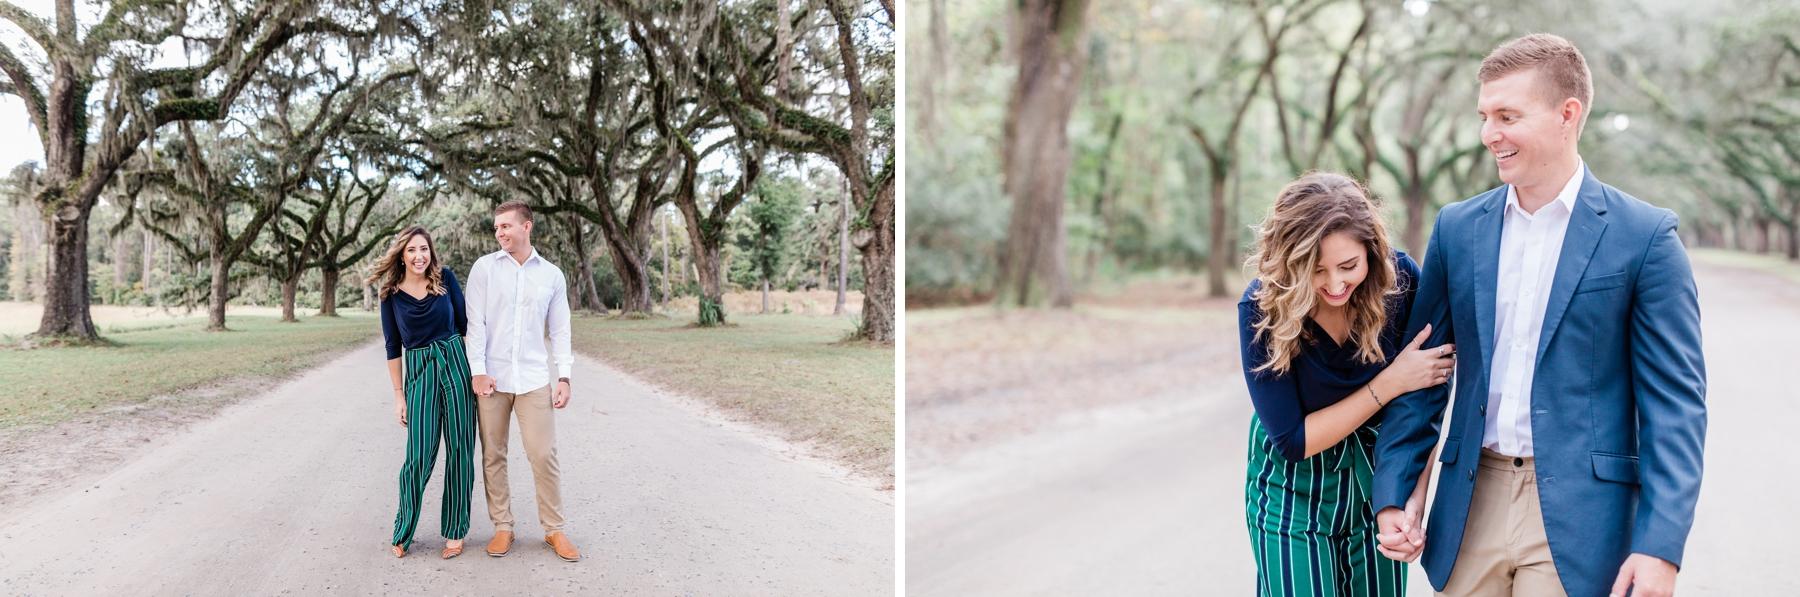 Apt-B-Photography-Haley-Tyler-Engagement-savannah-engagement-photographer-11.jpg